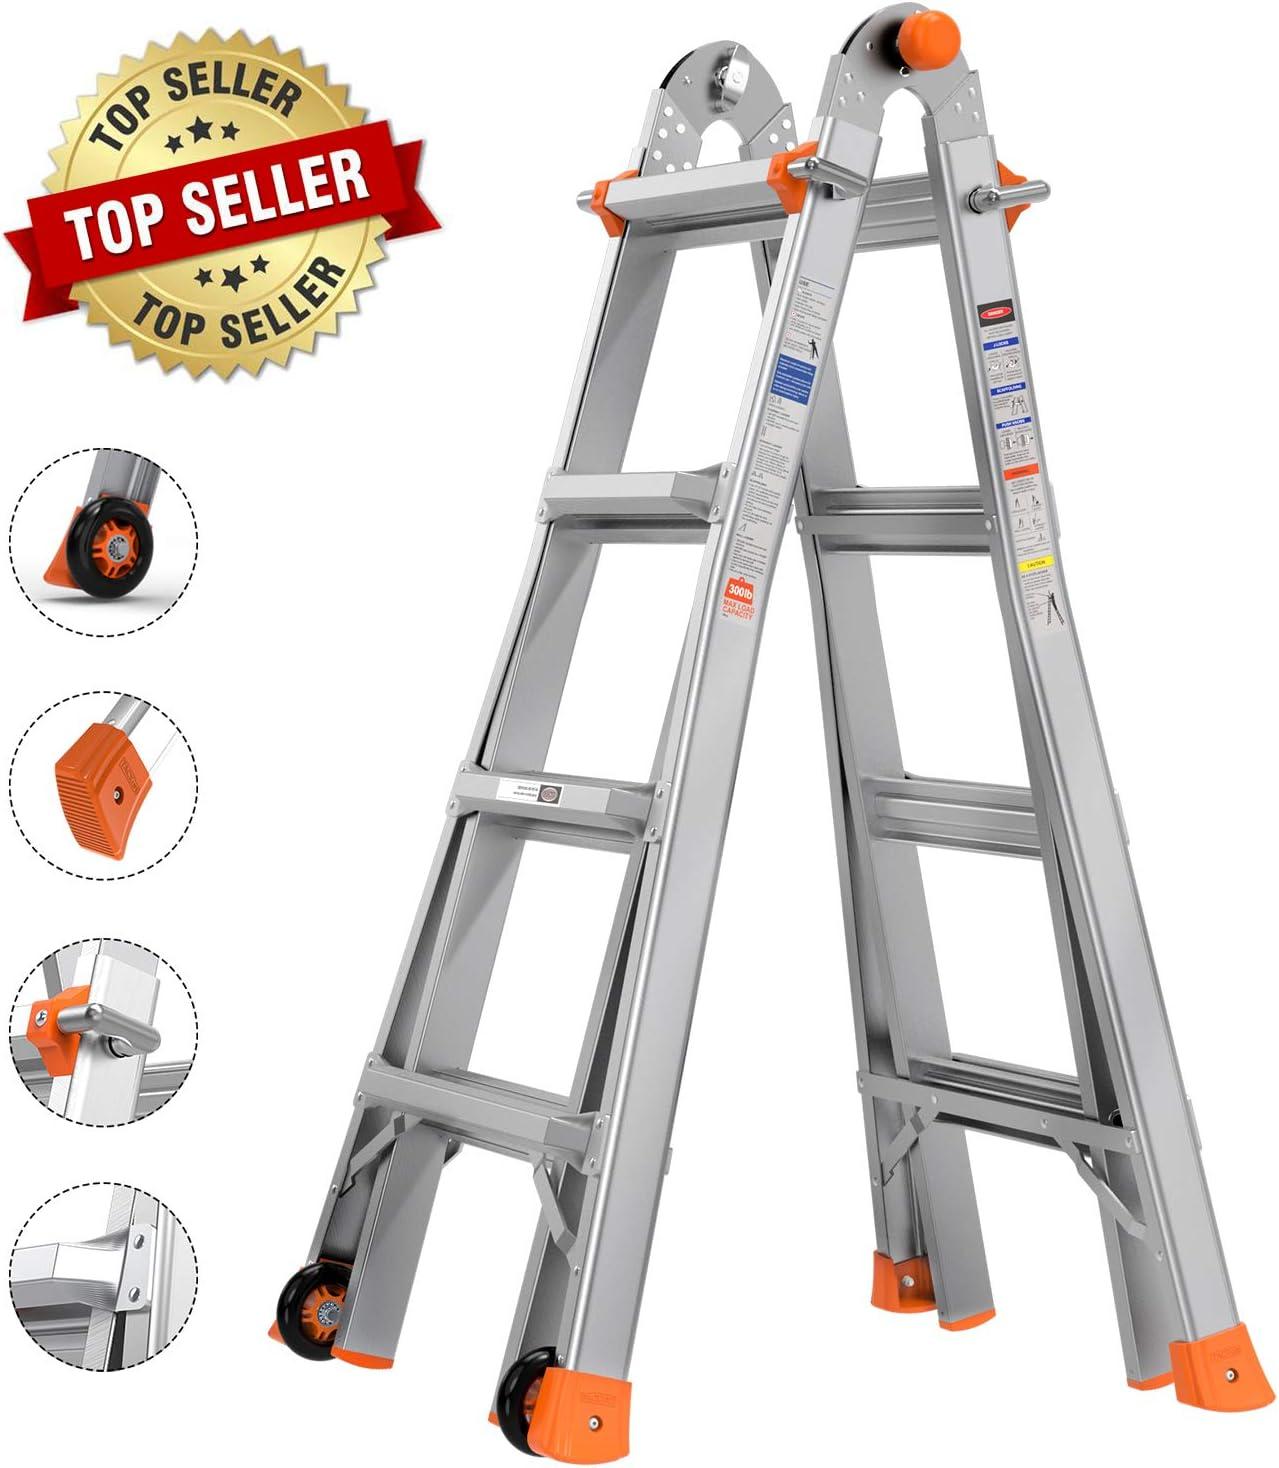 TACKLIFE Multi-Use Ladder, 17 Feet Aluminum Ladder